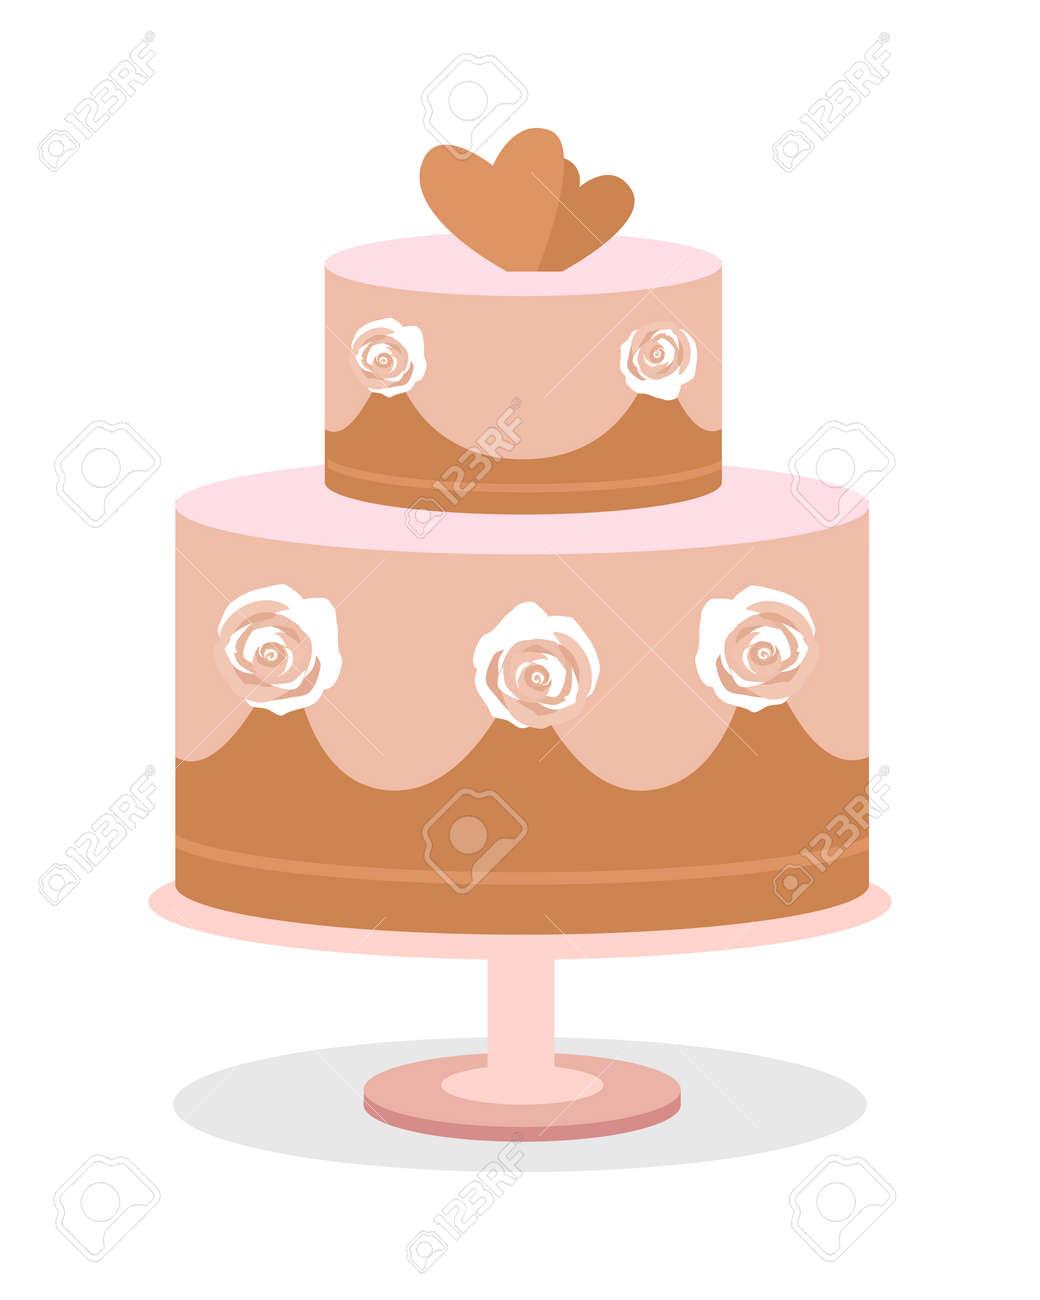 Wedding Cake Vector Illustration Flat Design Two Tier Chocolate